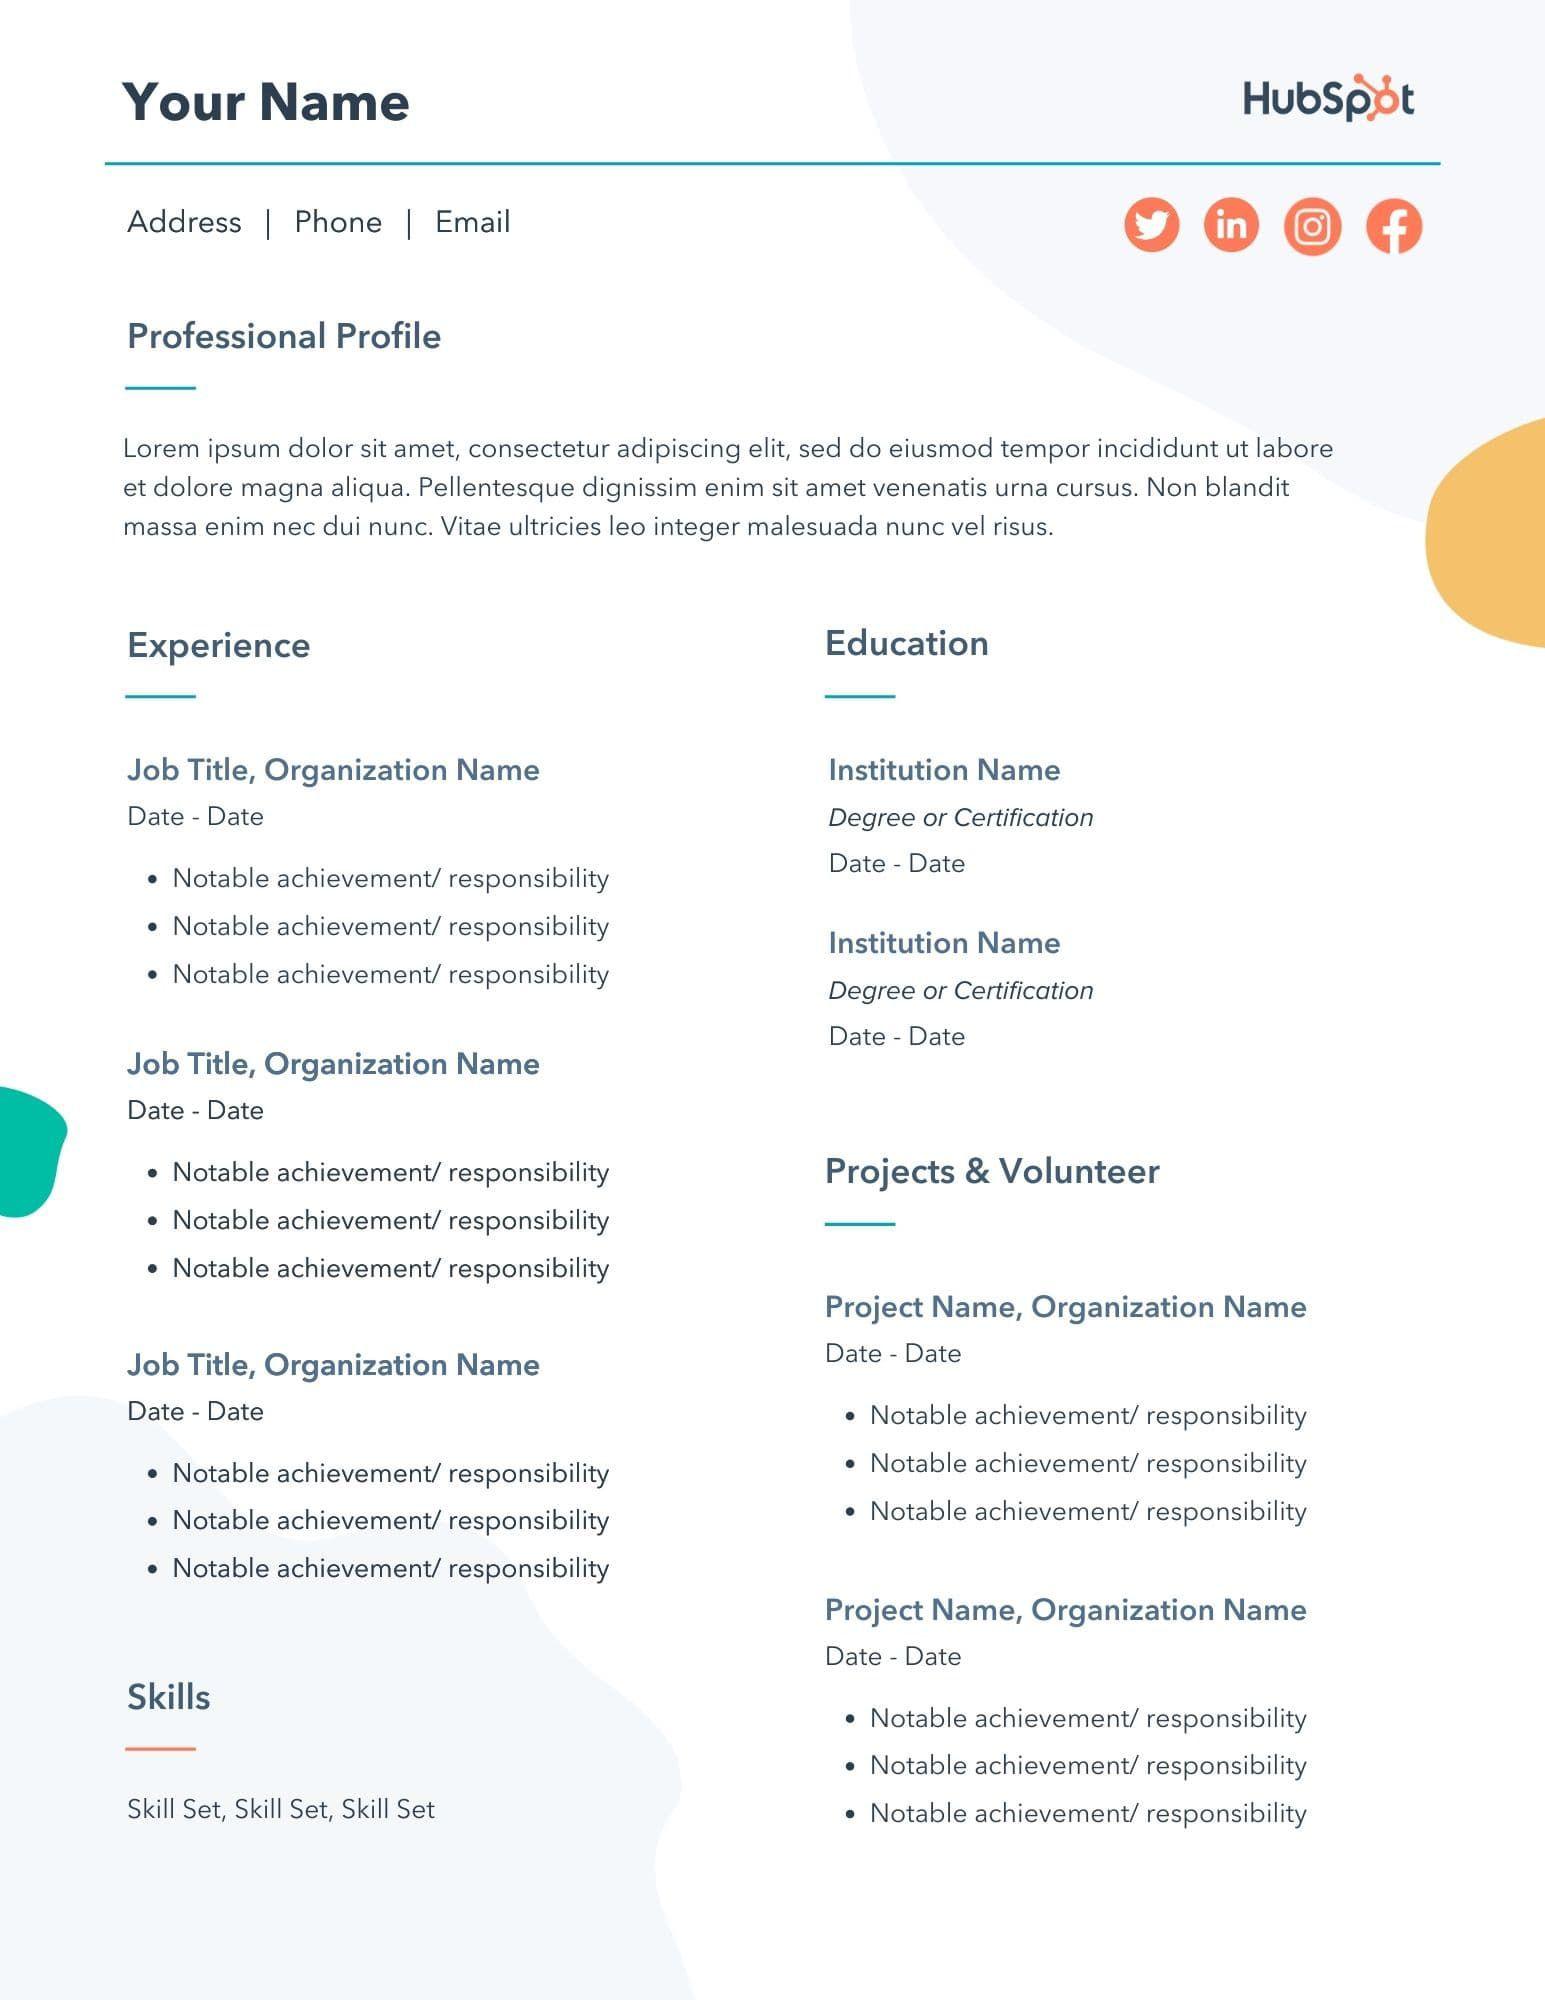 004 Impressive Resume Microsoft Word Template Inspiration  Cv/resume Design Tutorial With Federal DownloadFull